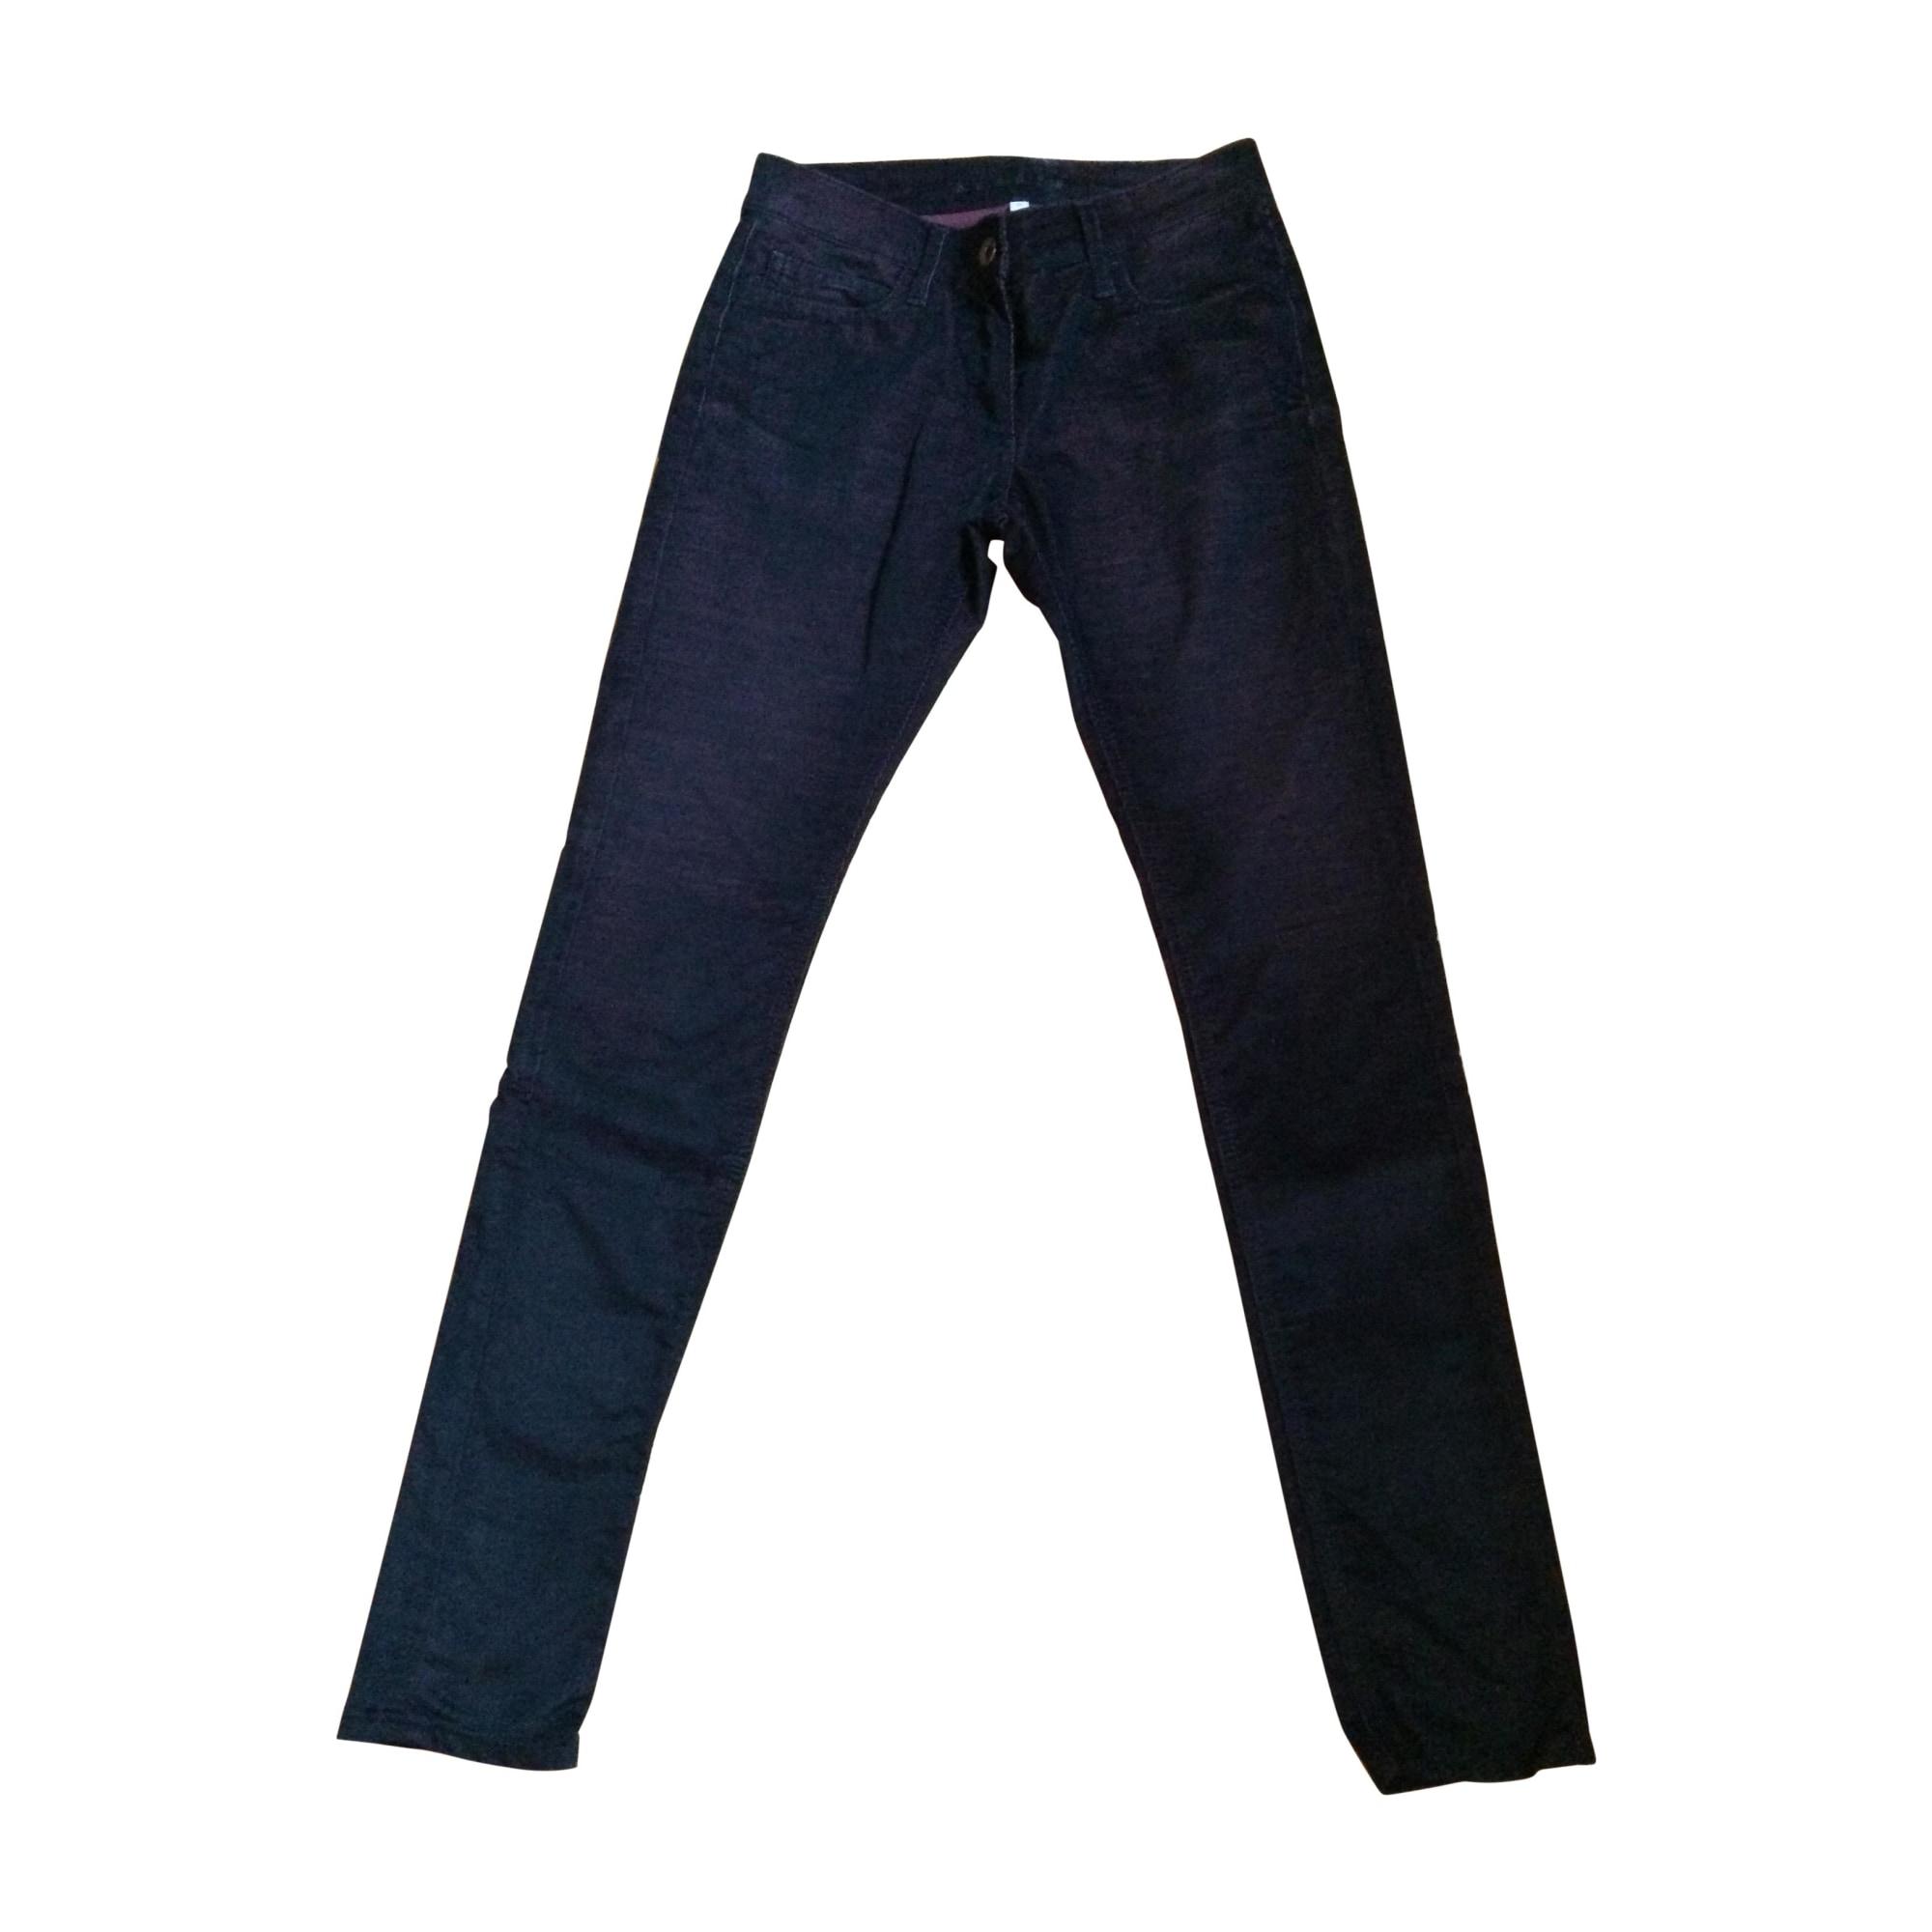 Pantalon slim, cigarette SANDRO Aubergine